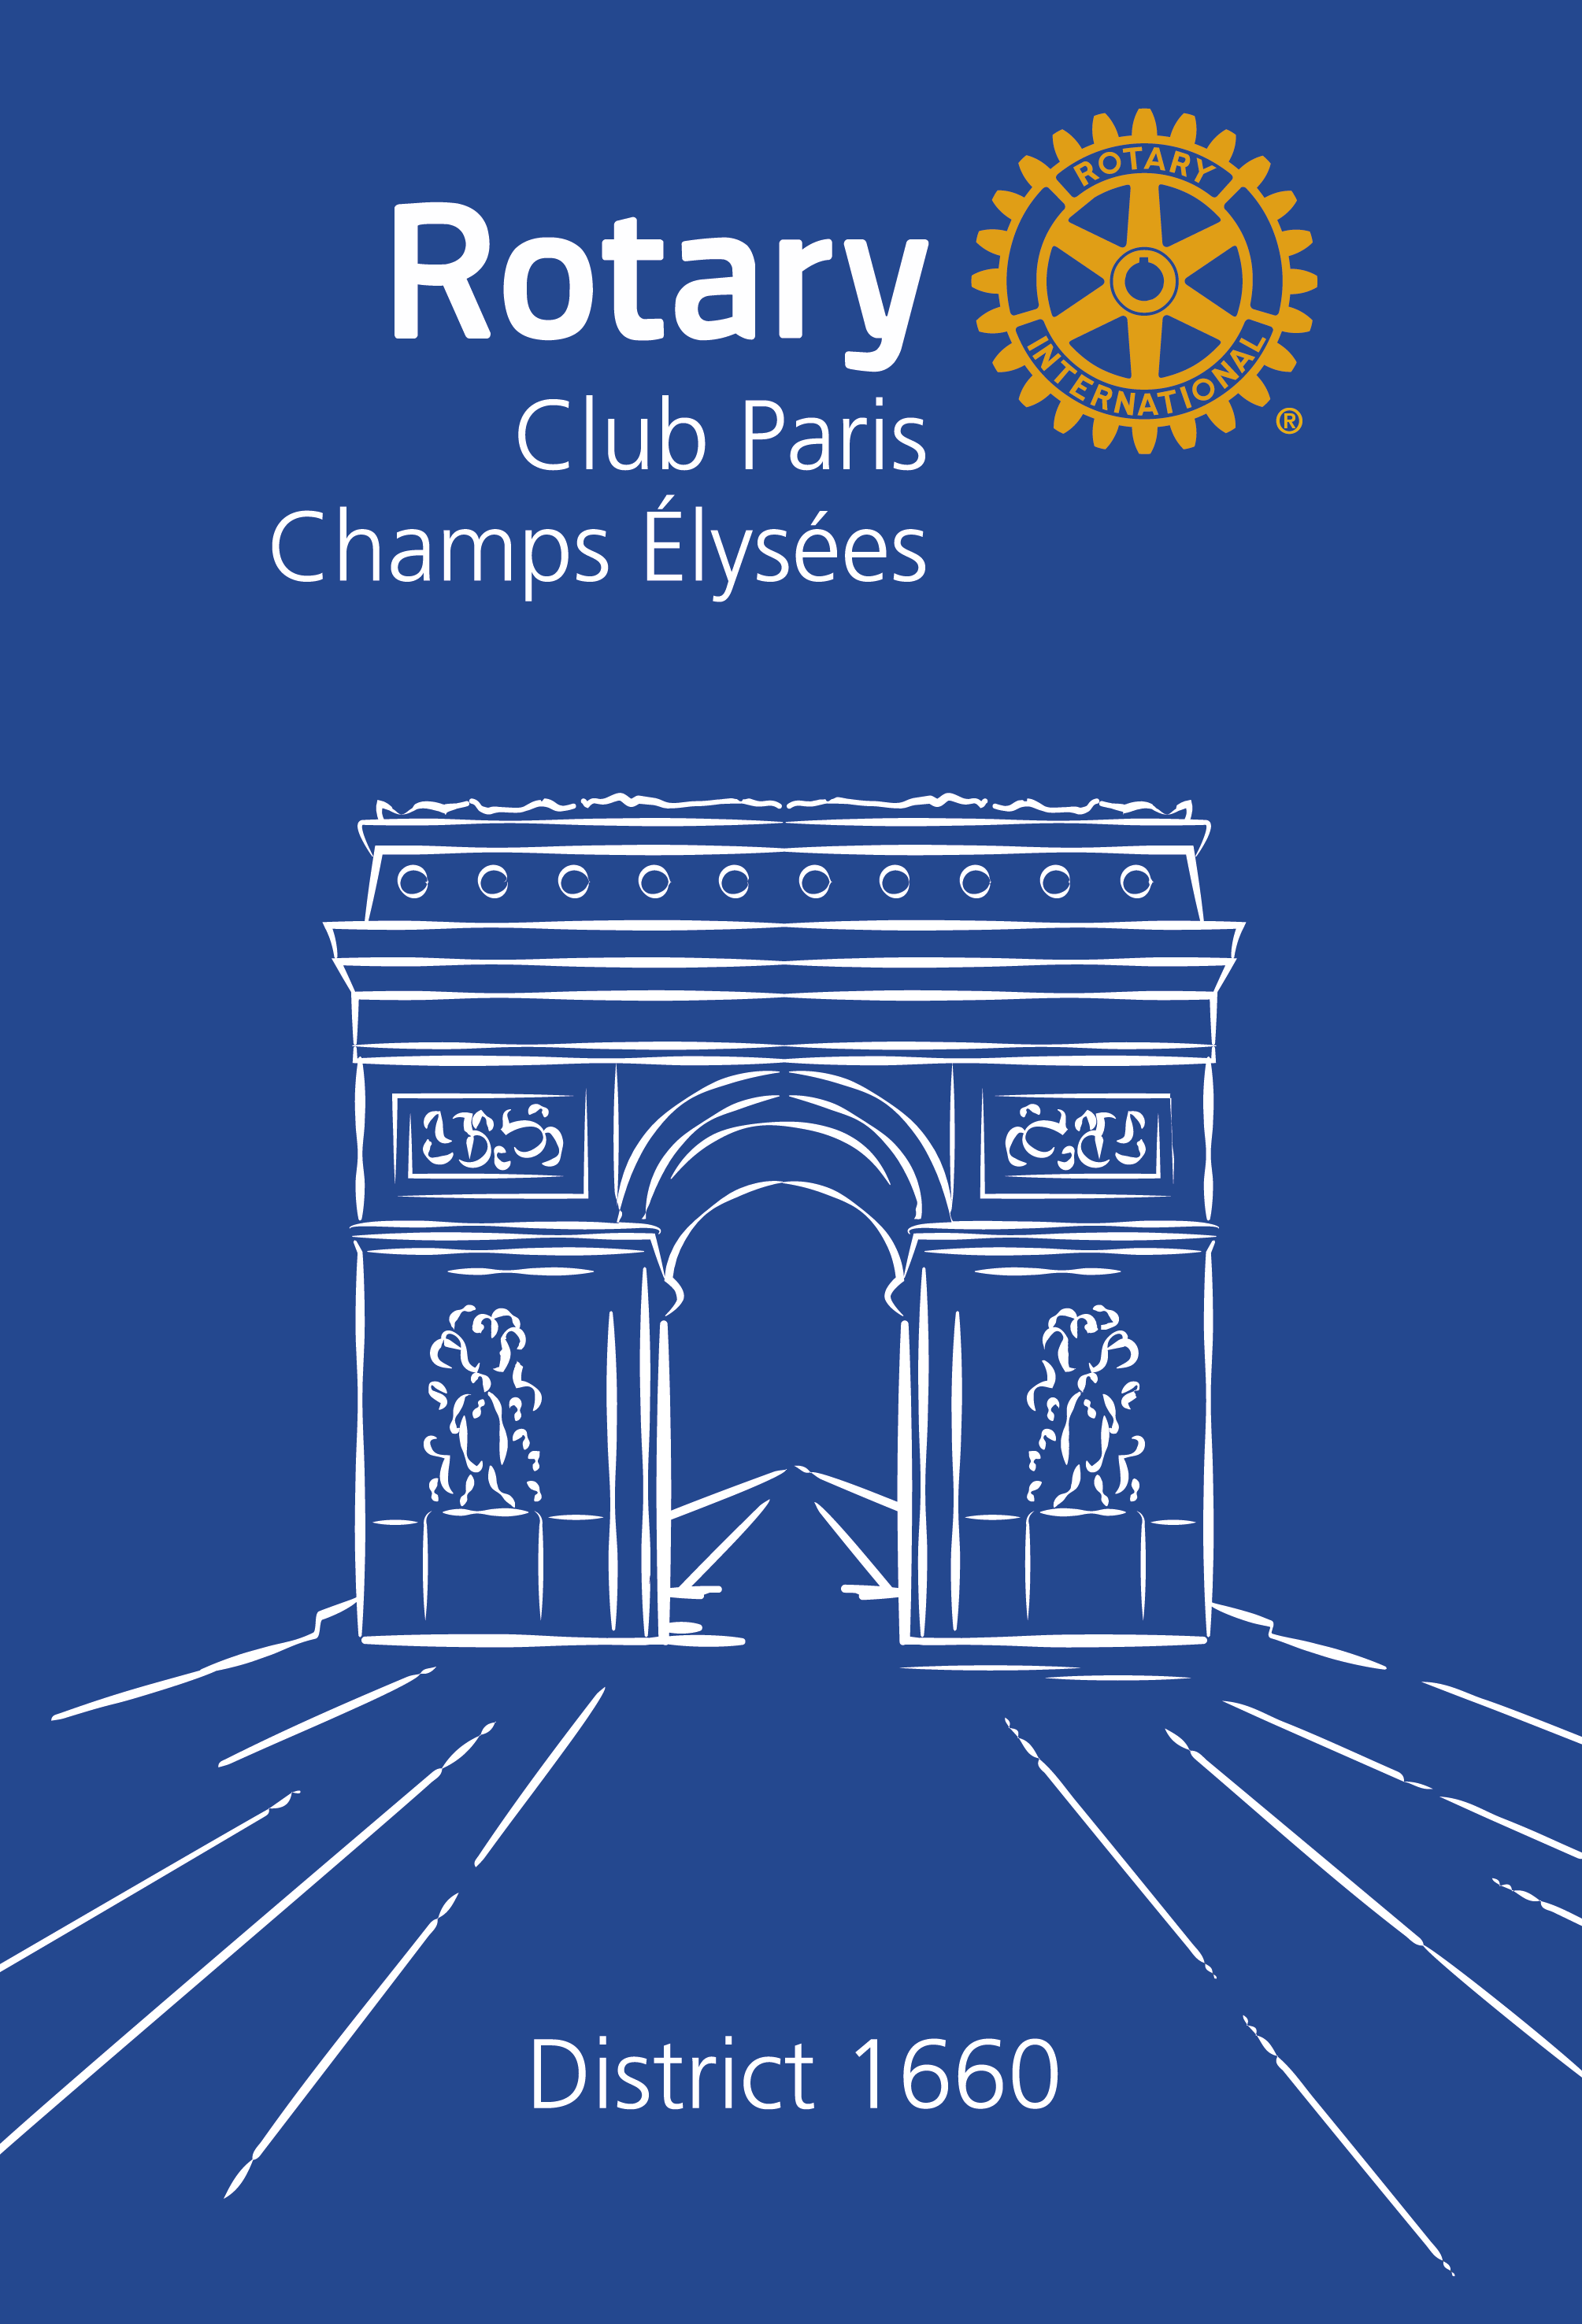 Rotary Club Paris Champs Elysées